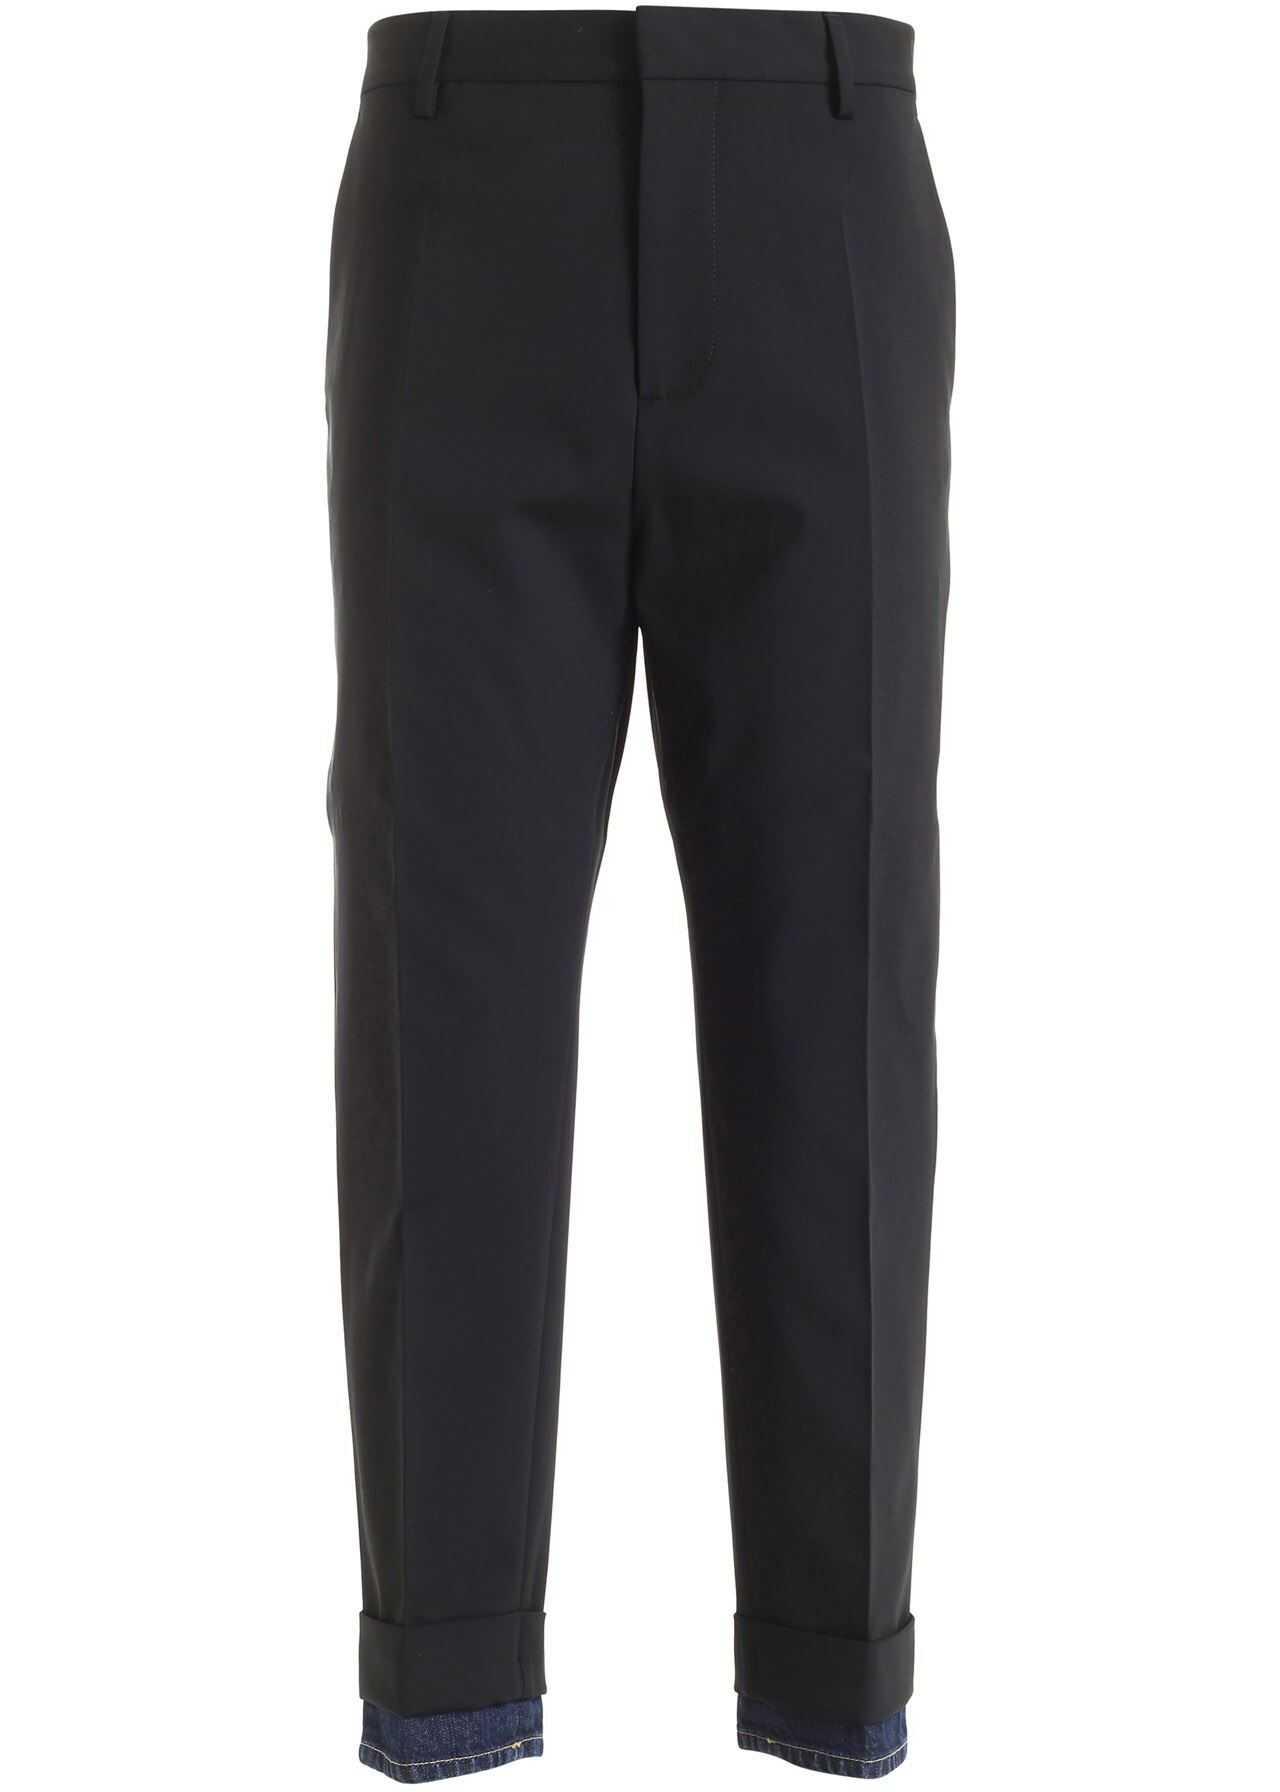 DSQUARED2 Black Cigarette Pants Featuring Denim Bottom Black imagine